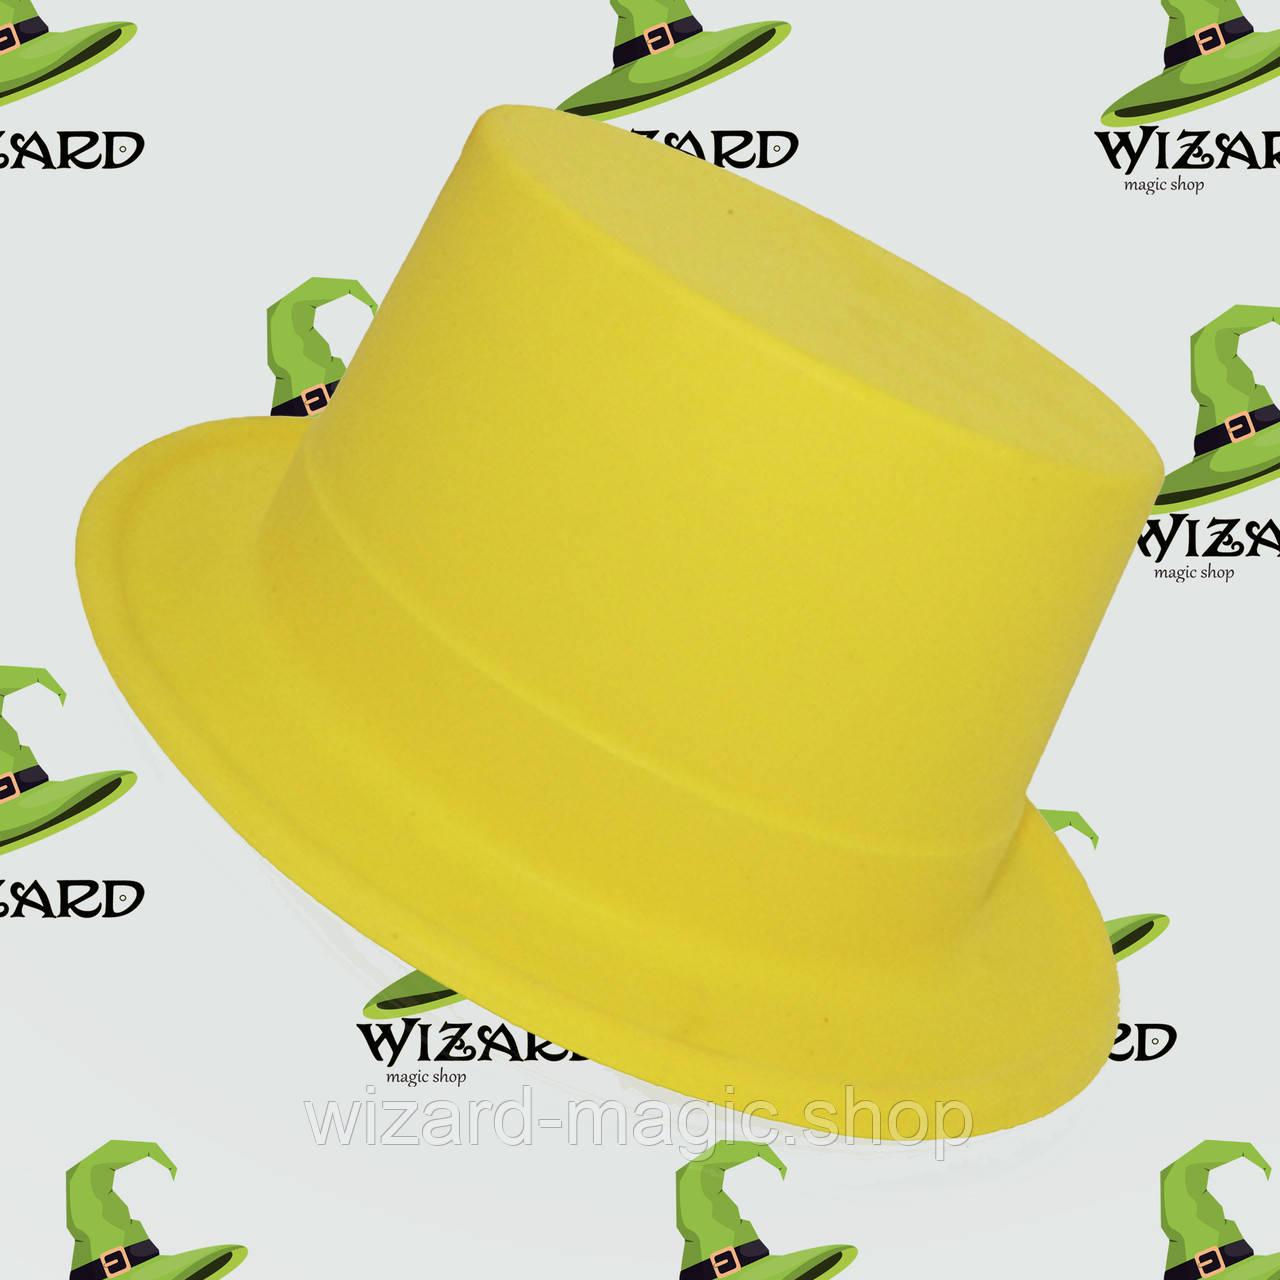 Шляпа Цилиндр с лентой Флок - Wizard Magic Shop в Харькове